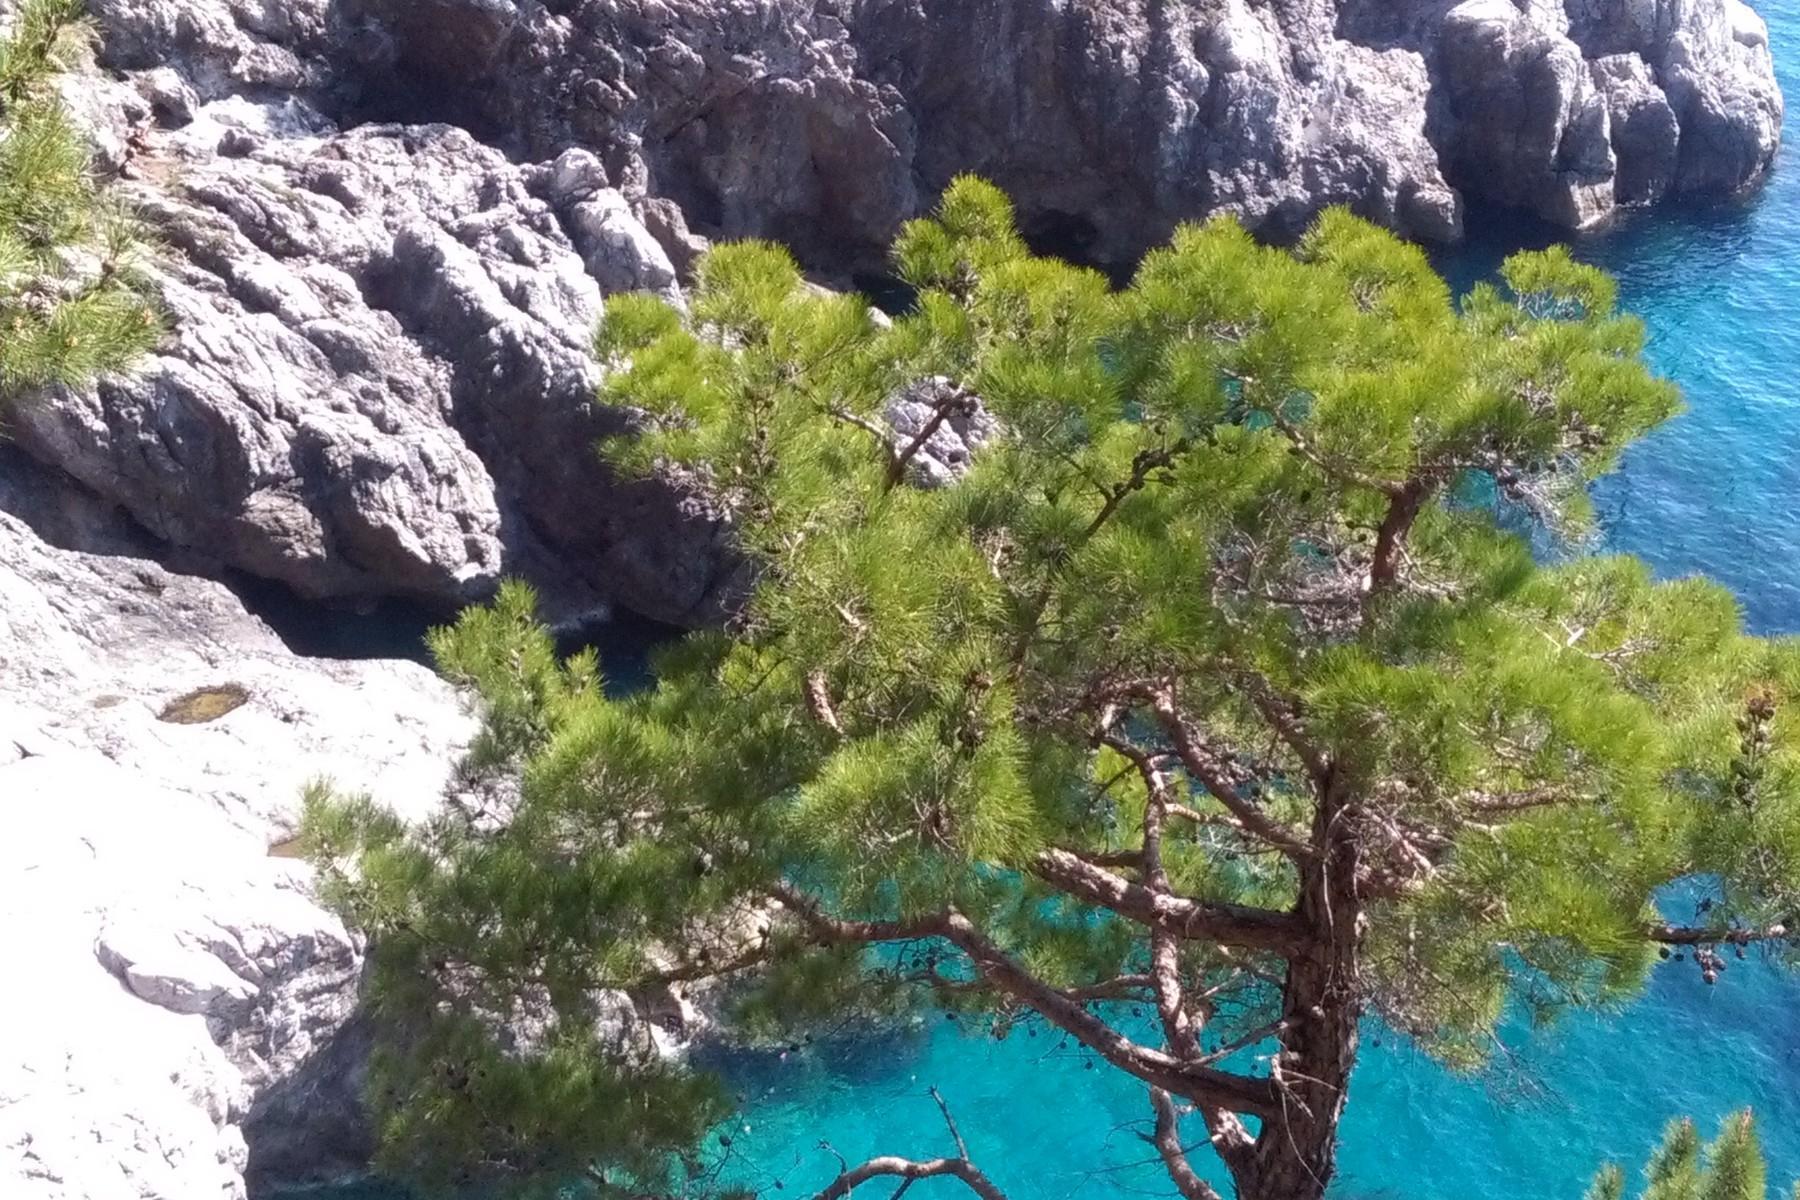 Villa pied dans l'eau in Costiera Amalfitana - 30